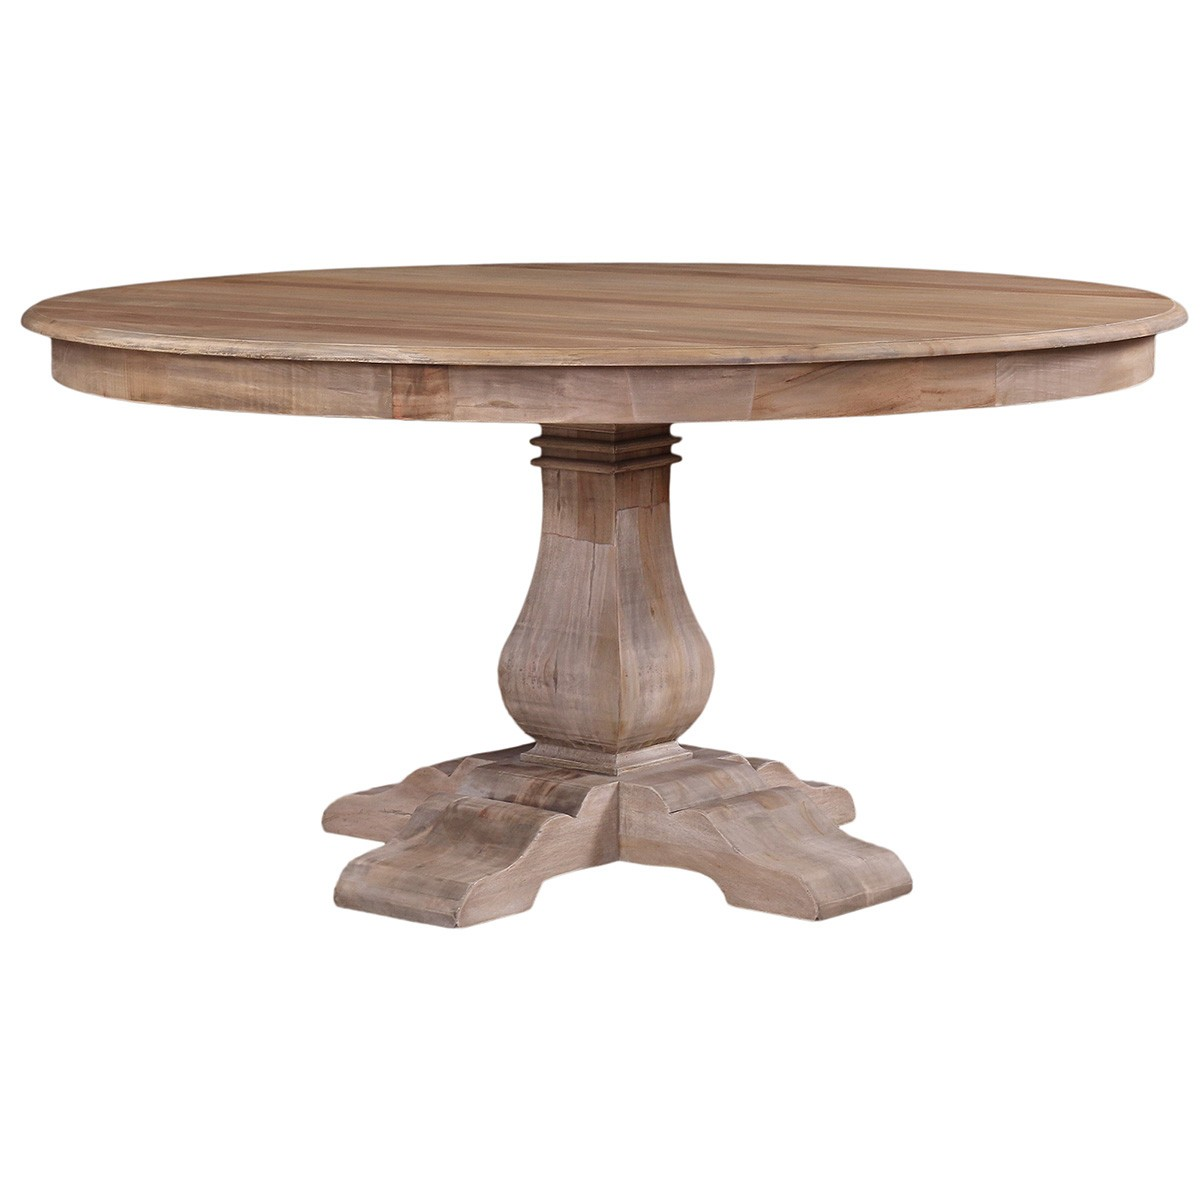 Calverton Mahogany Timber Round Dining Table, 153cm, Vintage Birch